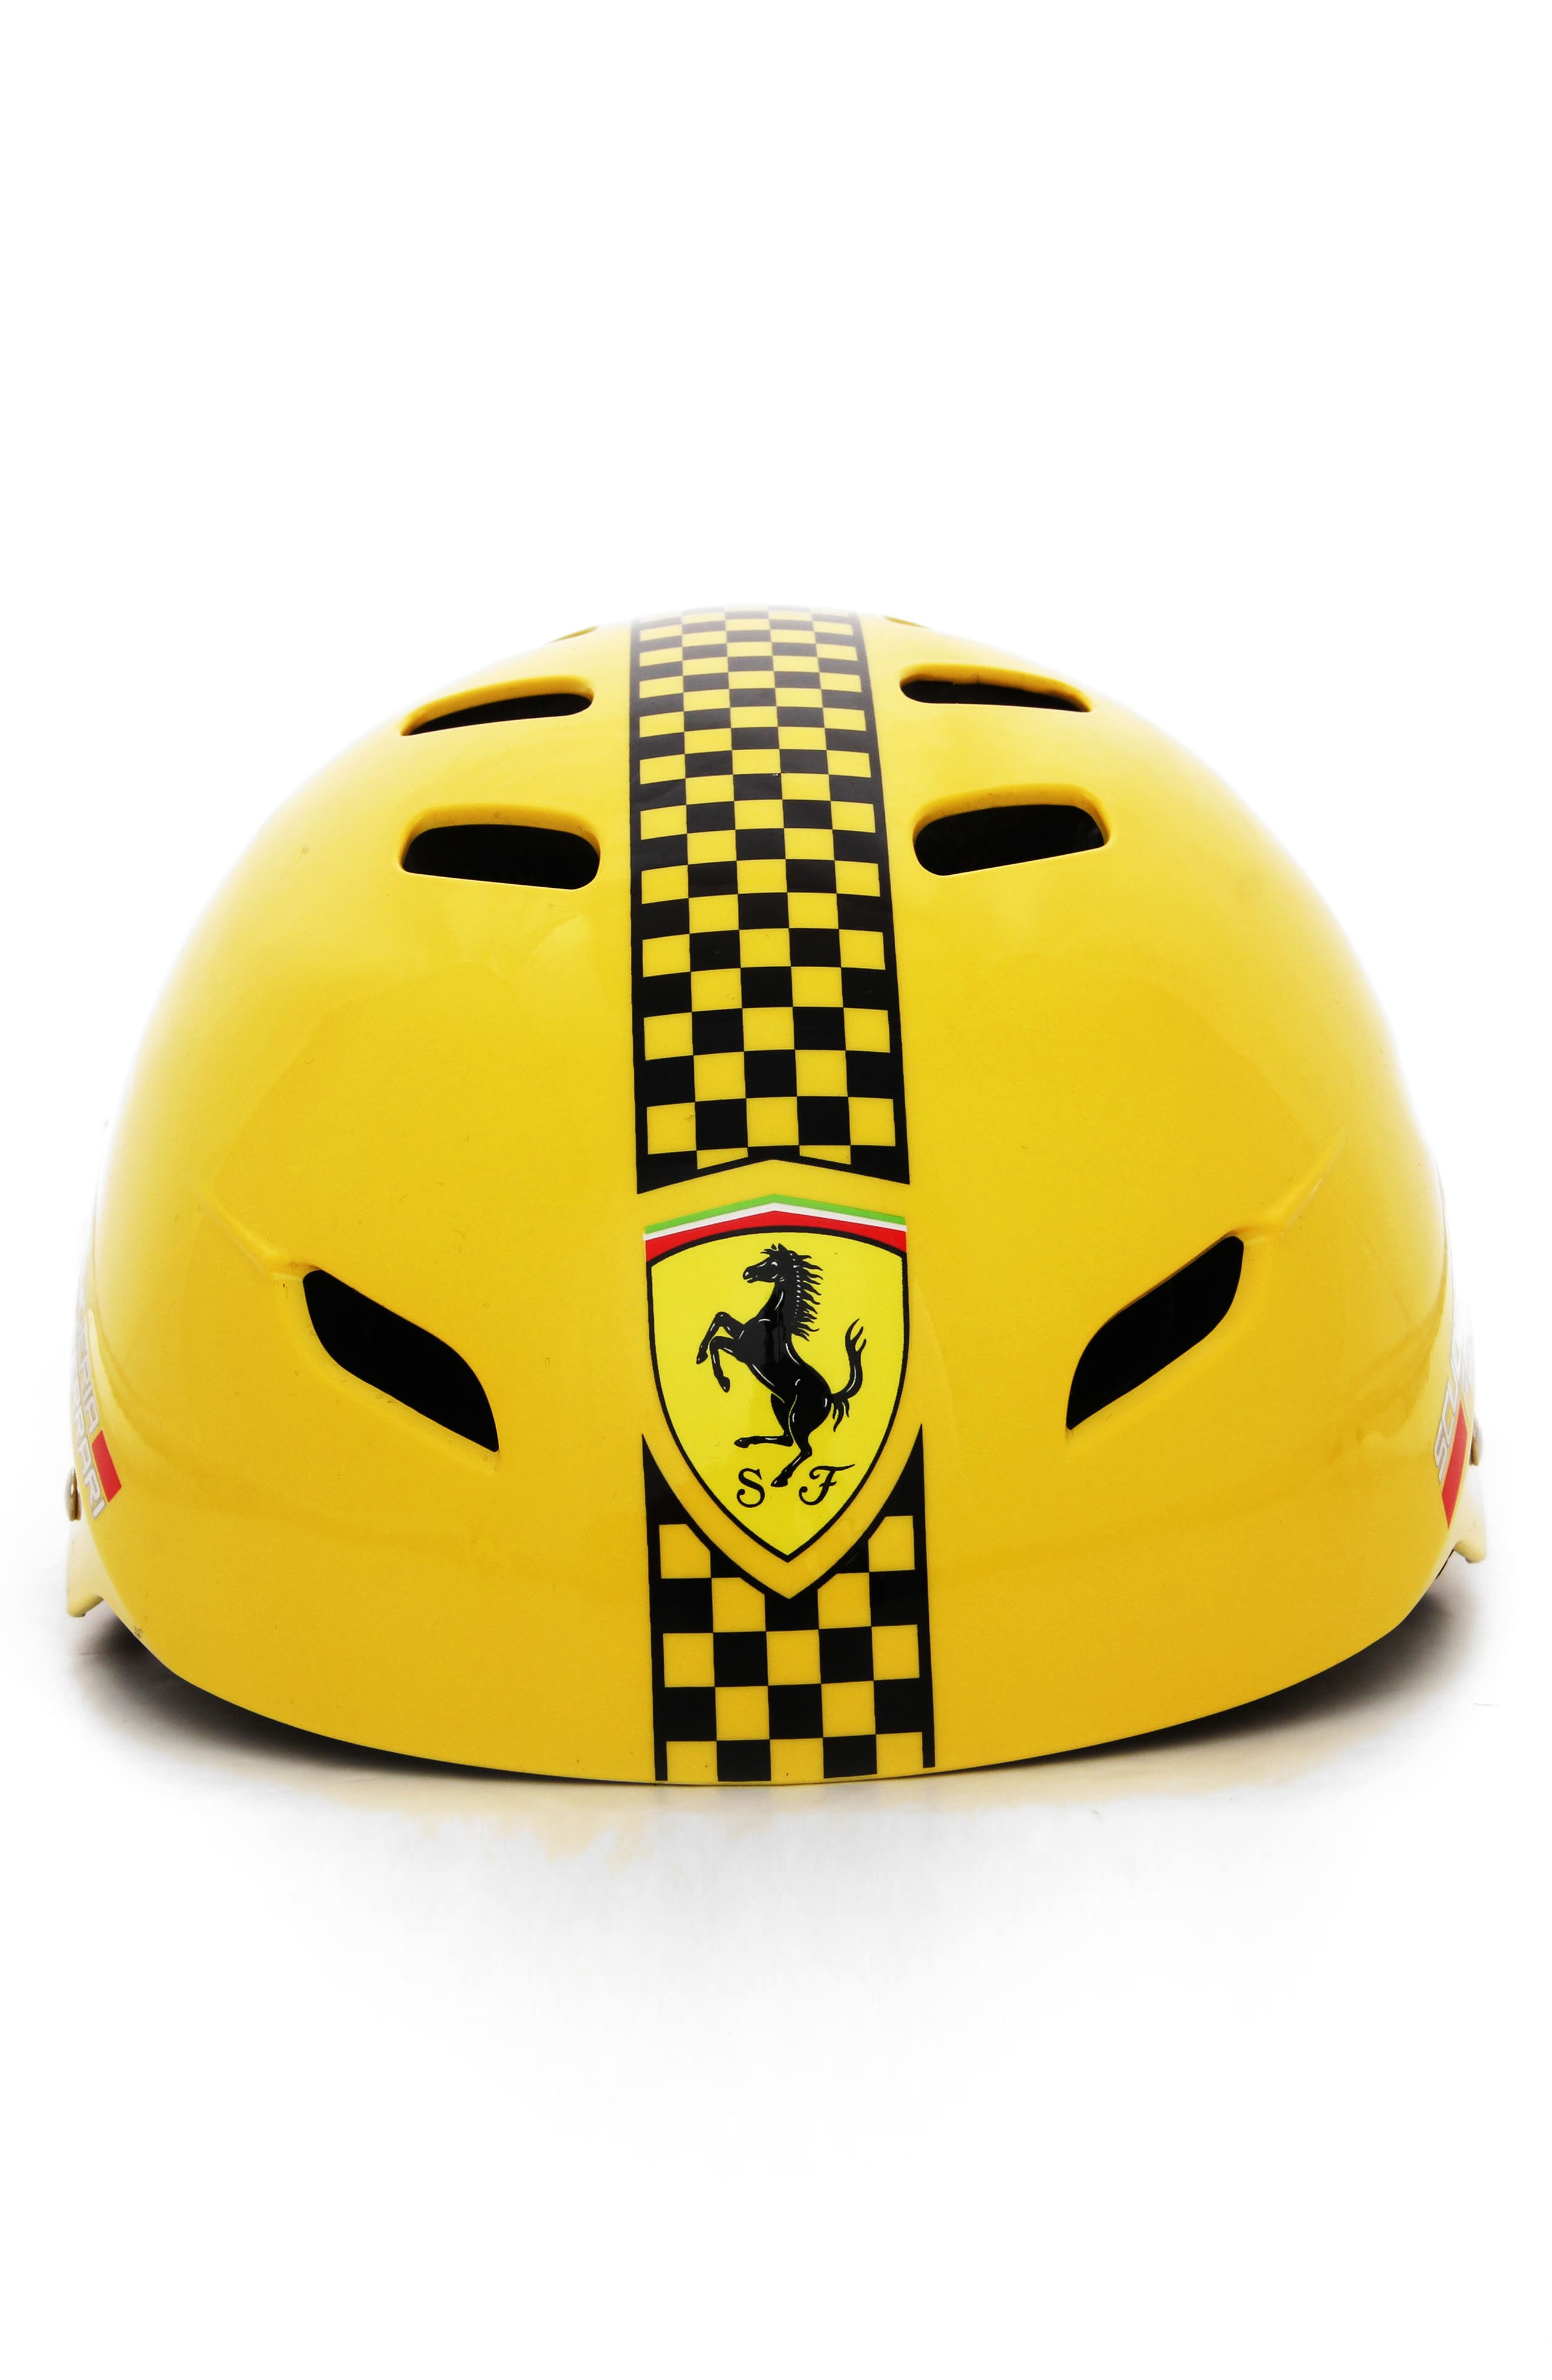 F1 Racing Helmet,                         Main,                         color, YELLOW